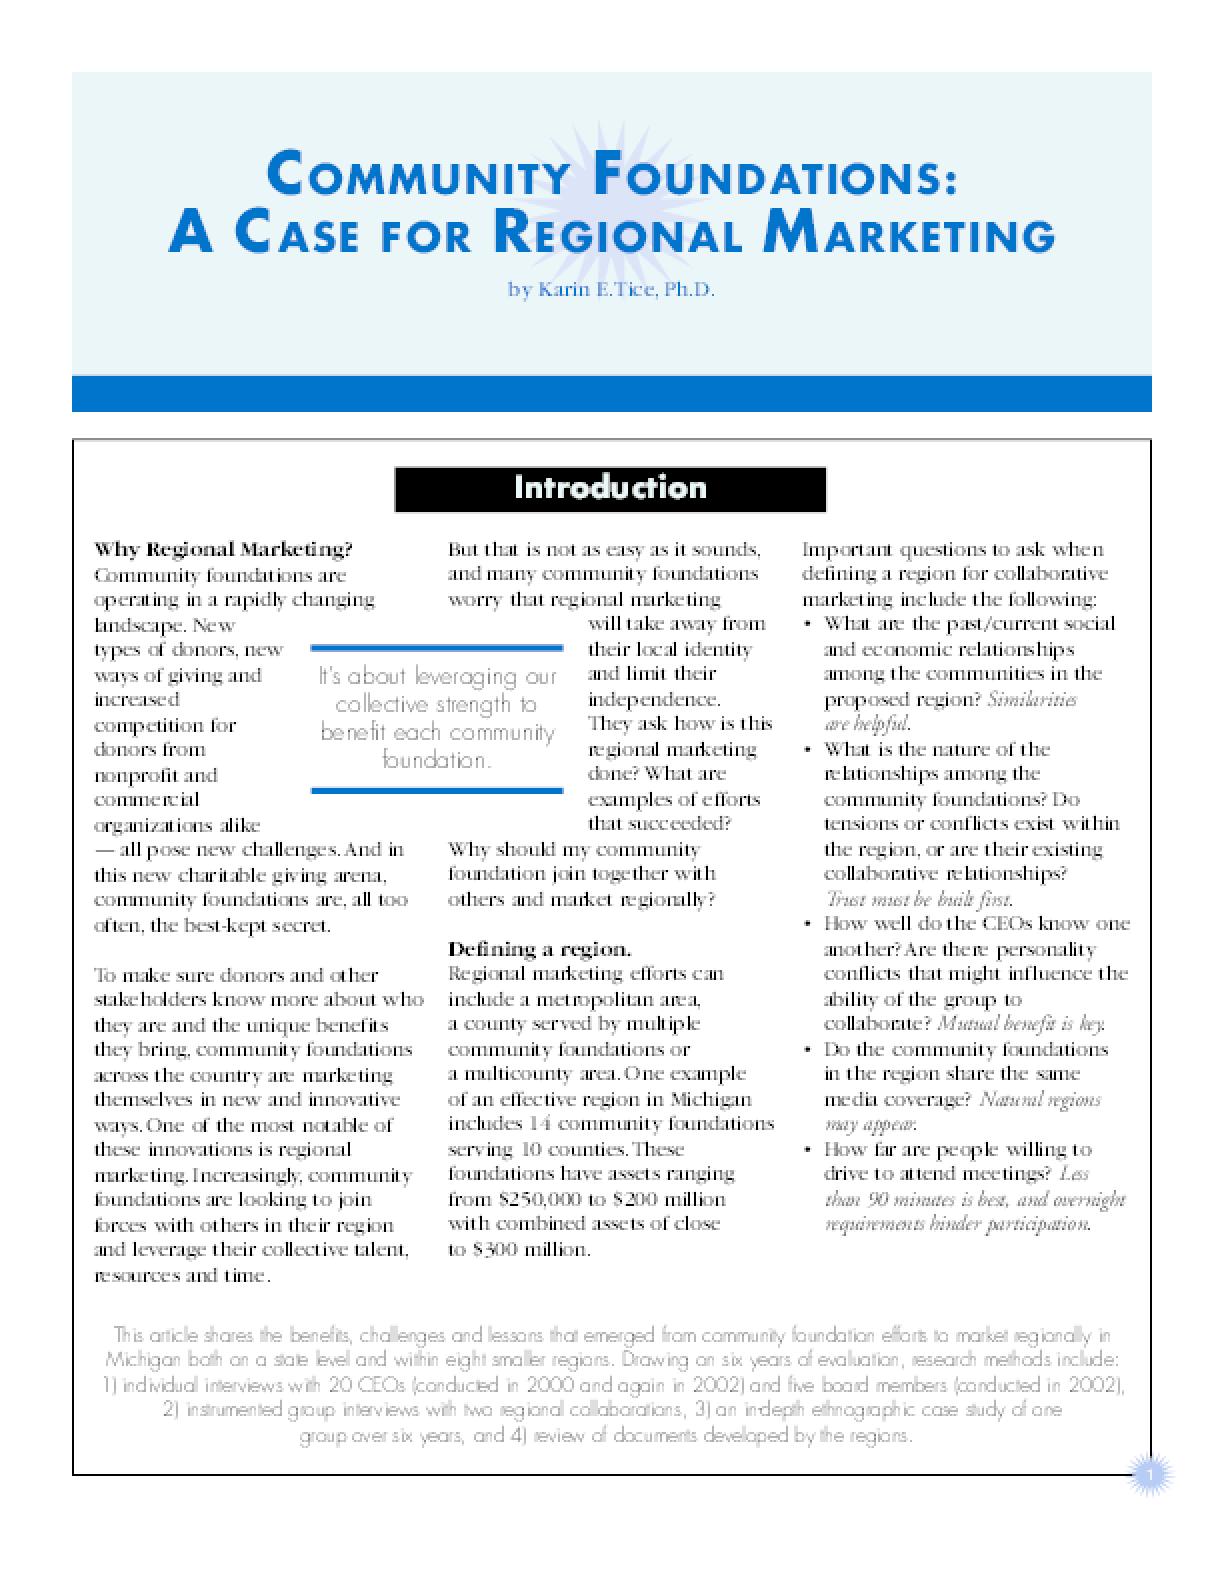 Community Foundations: A Case for Regional Marketing